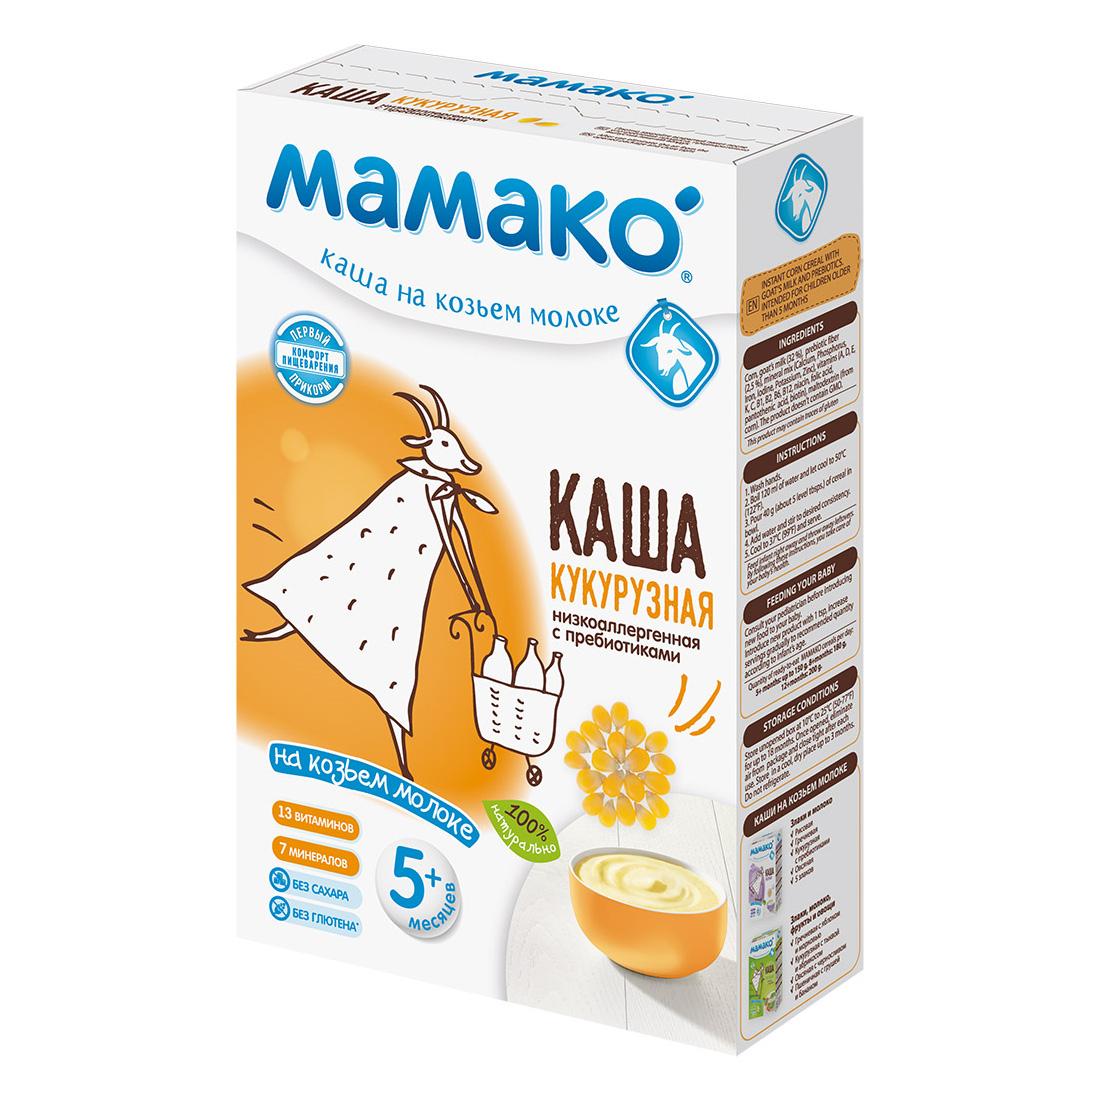 Каша Mamako на козьем молоке 200 гр Кукурузная с пребиотиками (с 5 мес)